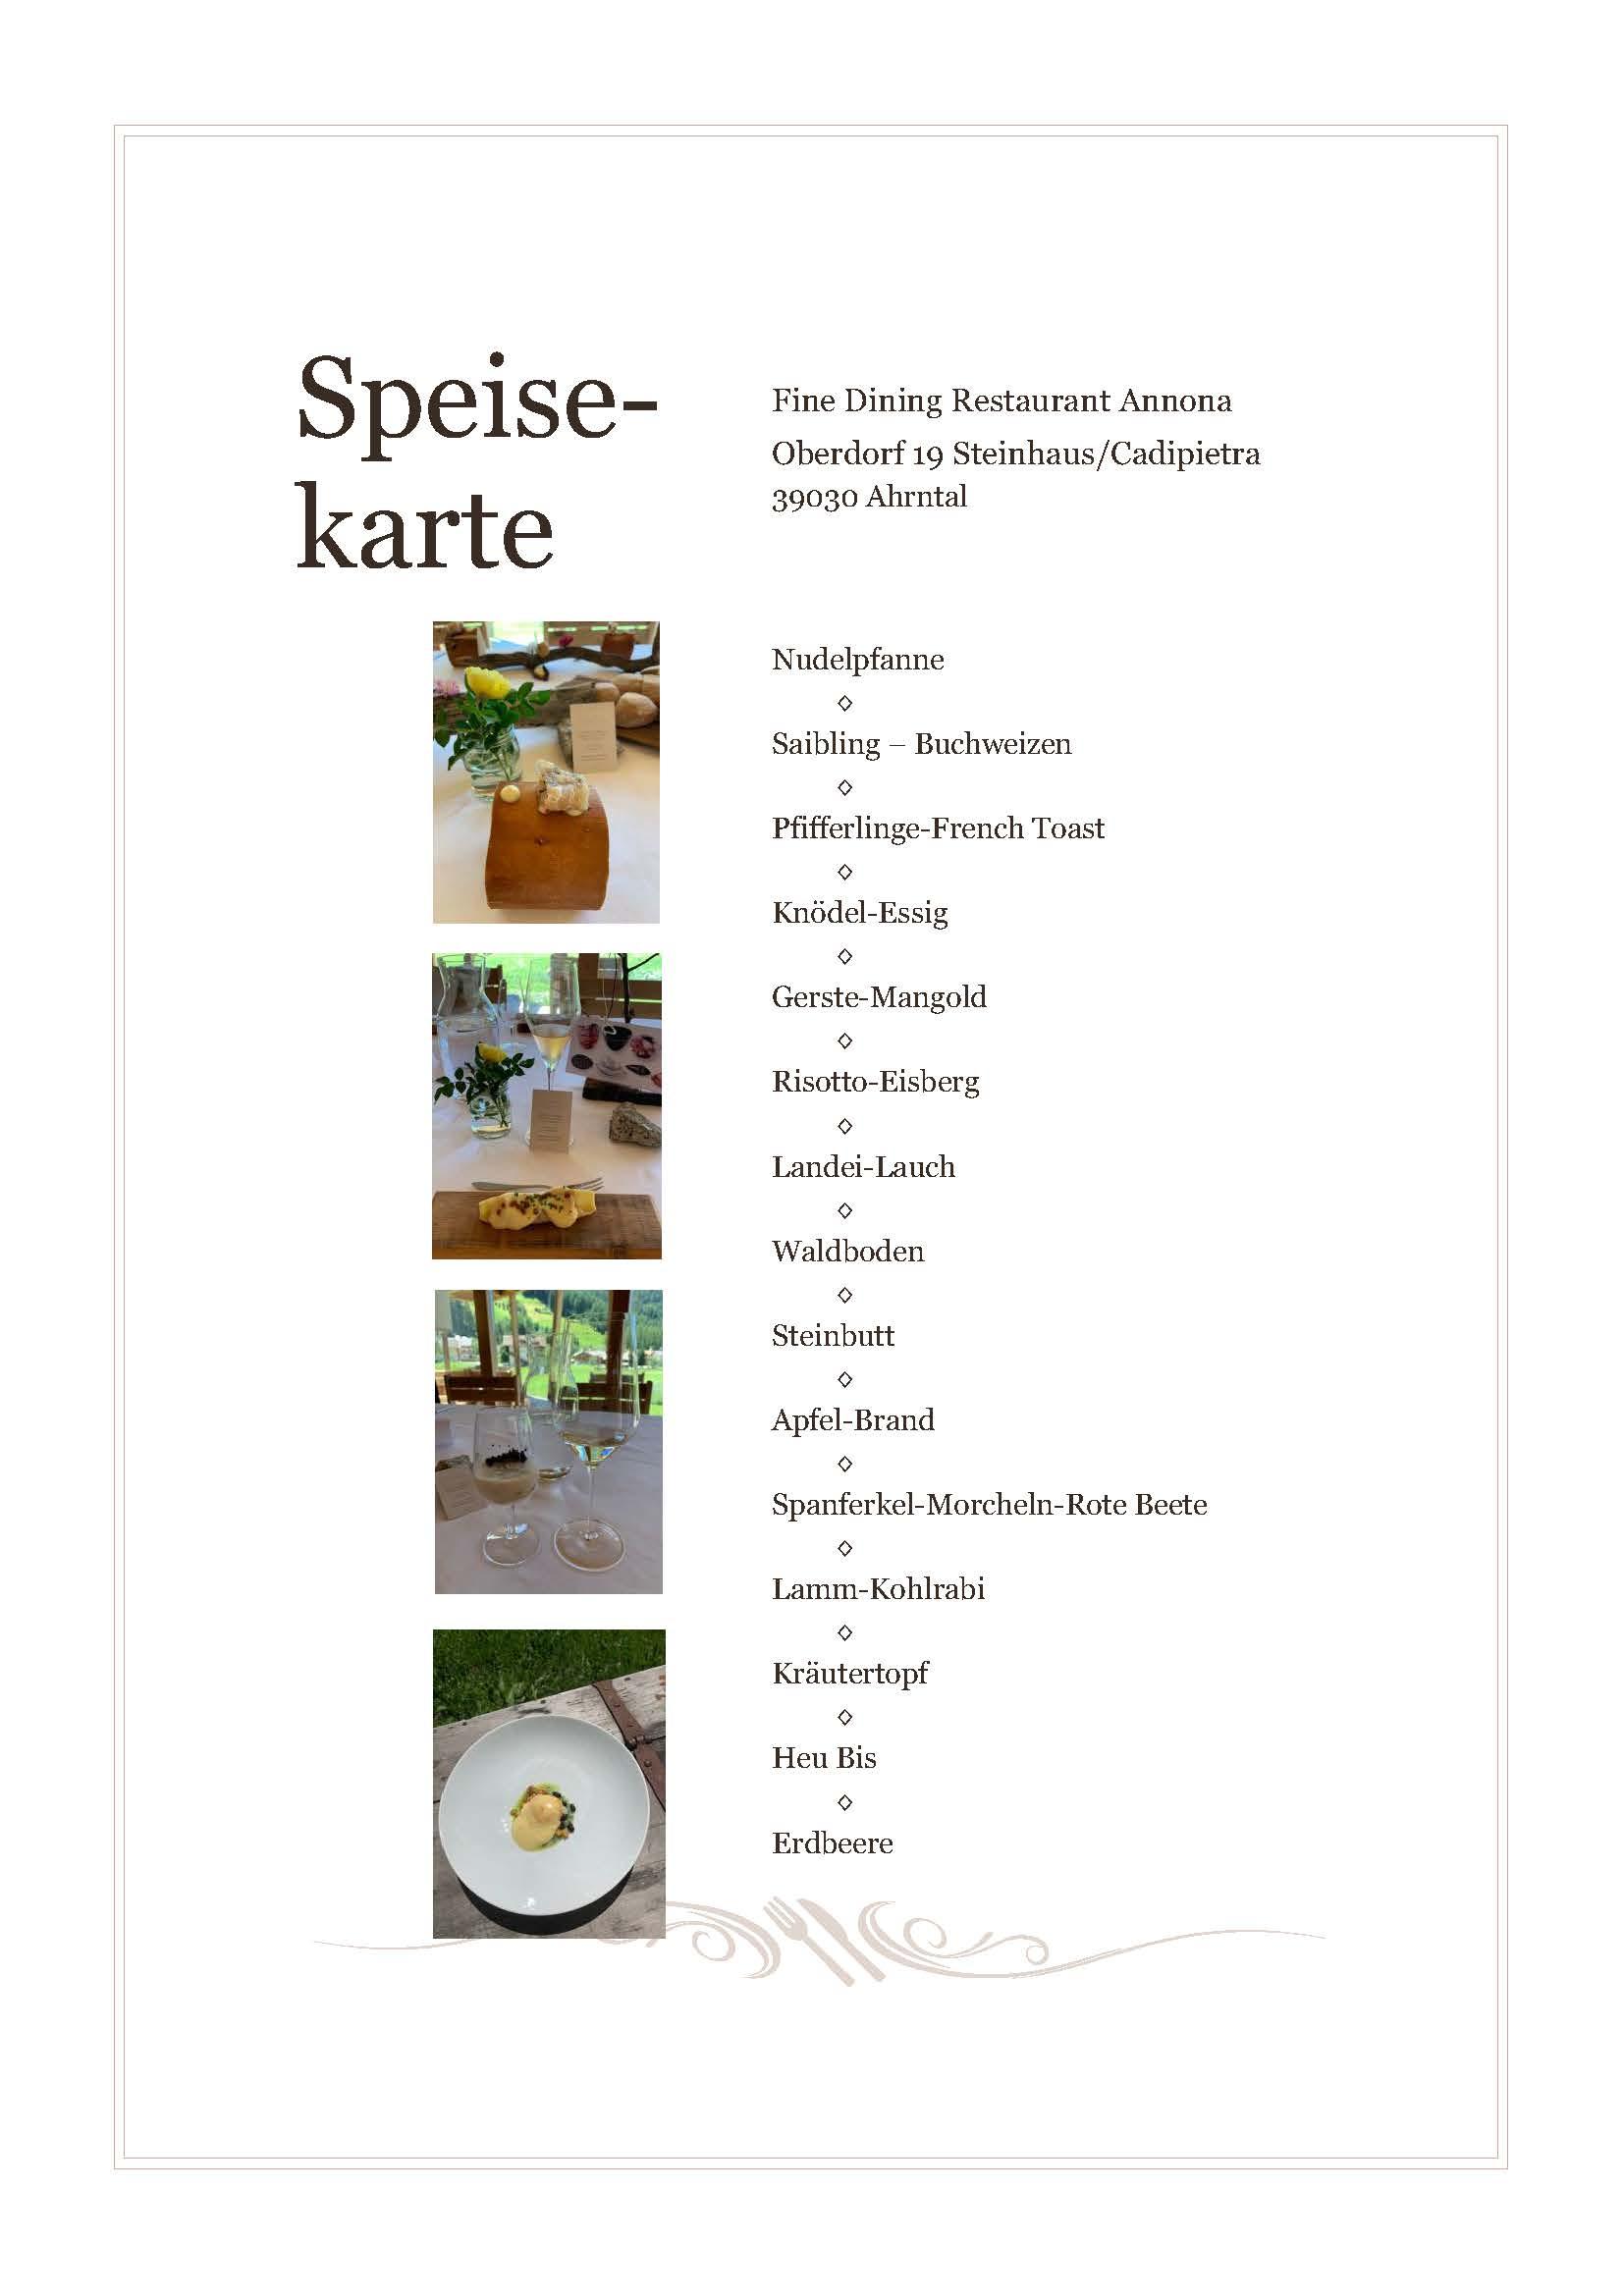 Unser Menü im Alpine Cuisine Restaurant Annona